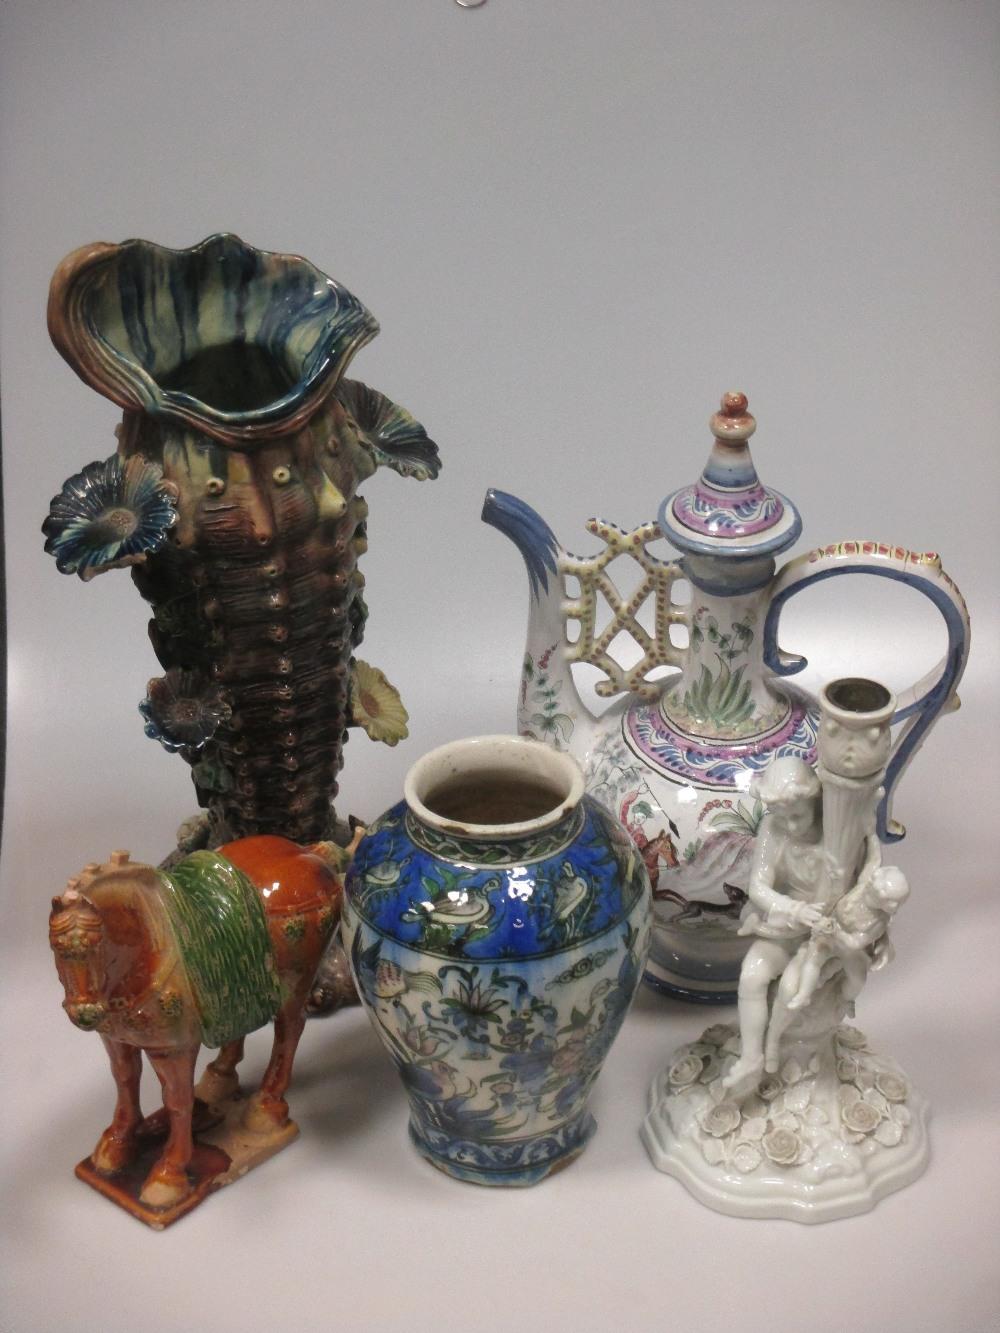 Lot 23 - A Persian vase, a Portuguese Persian style ewer, a Sitzendorf white glazed figural candlesticks,